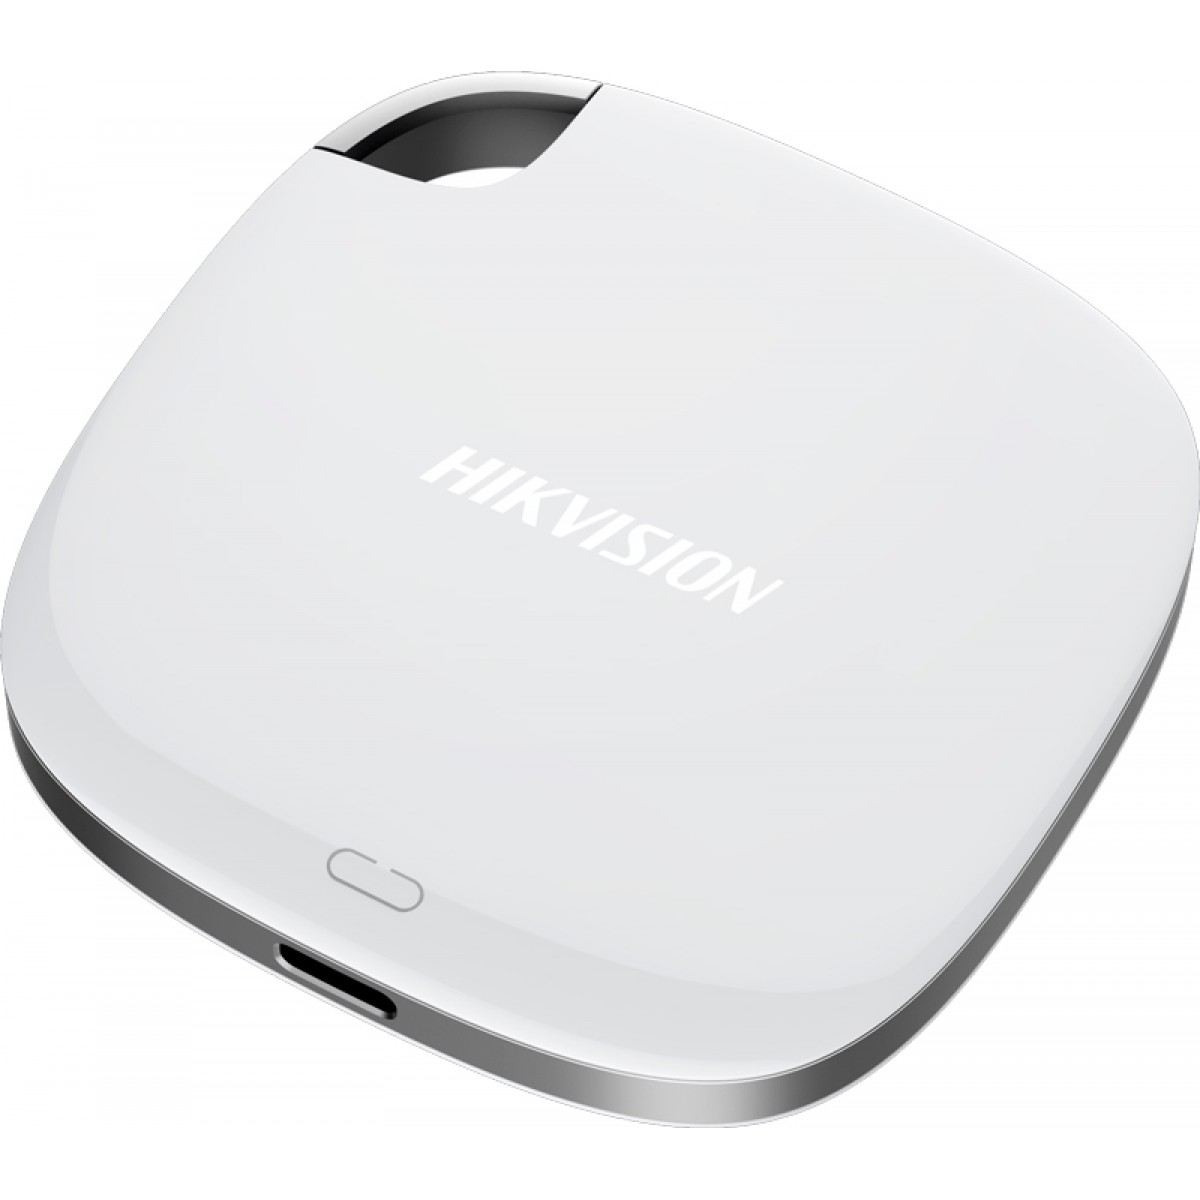 SSD Externo Portátil Hikvision T100I 240GB, USB 3.1, White